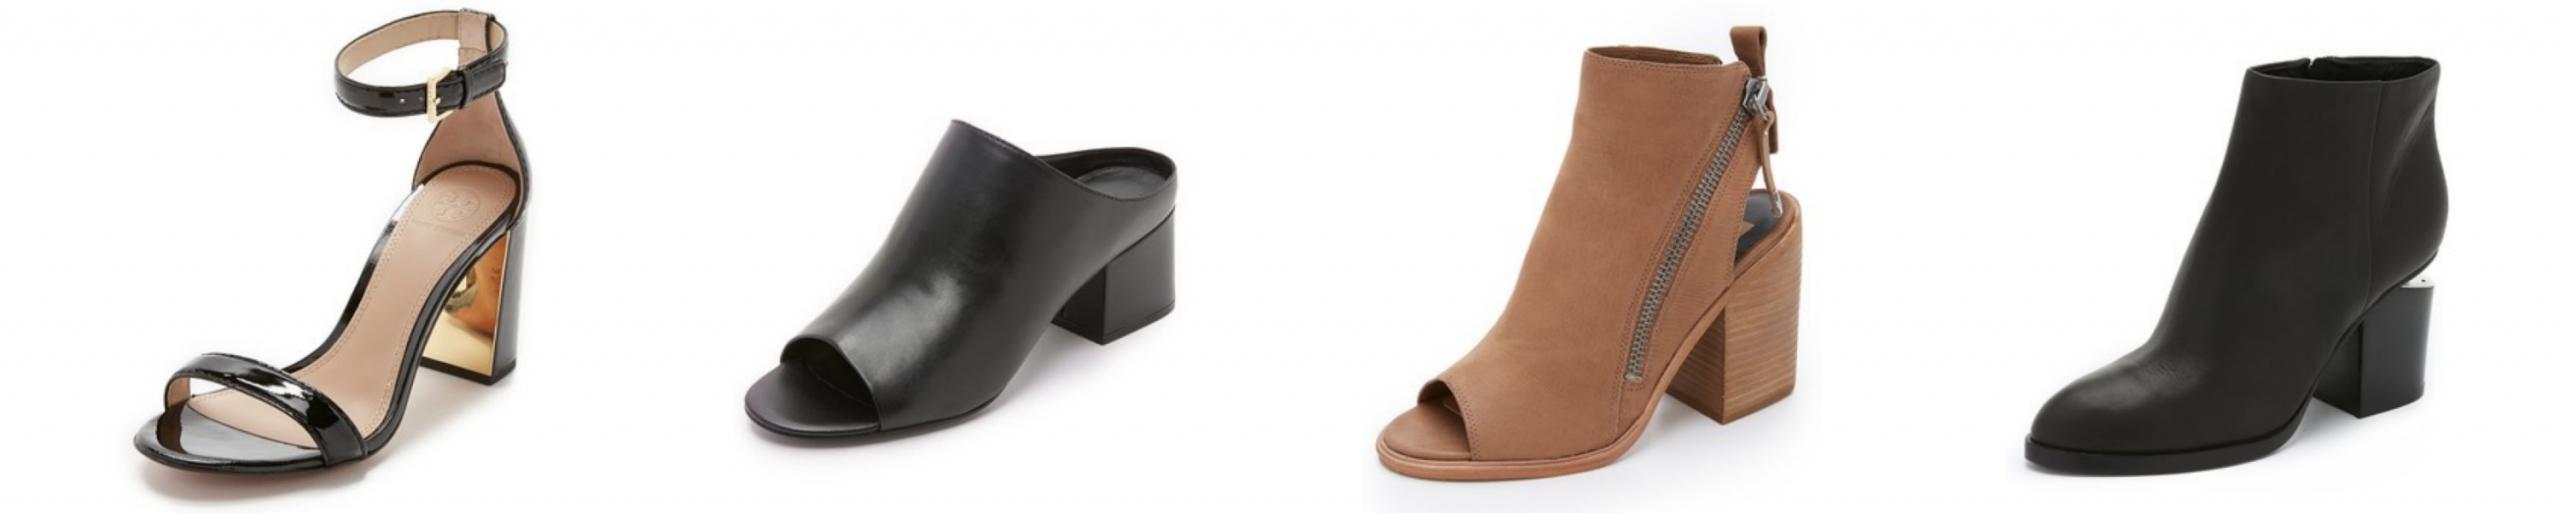 shoesiddle